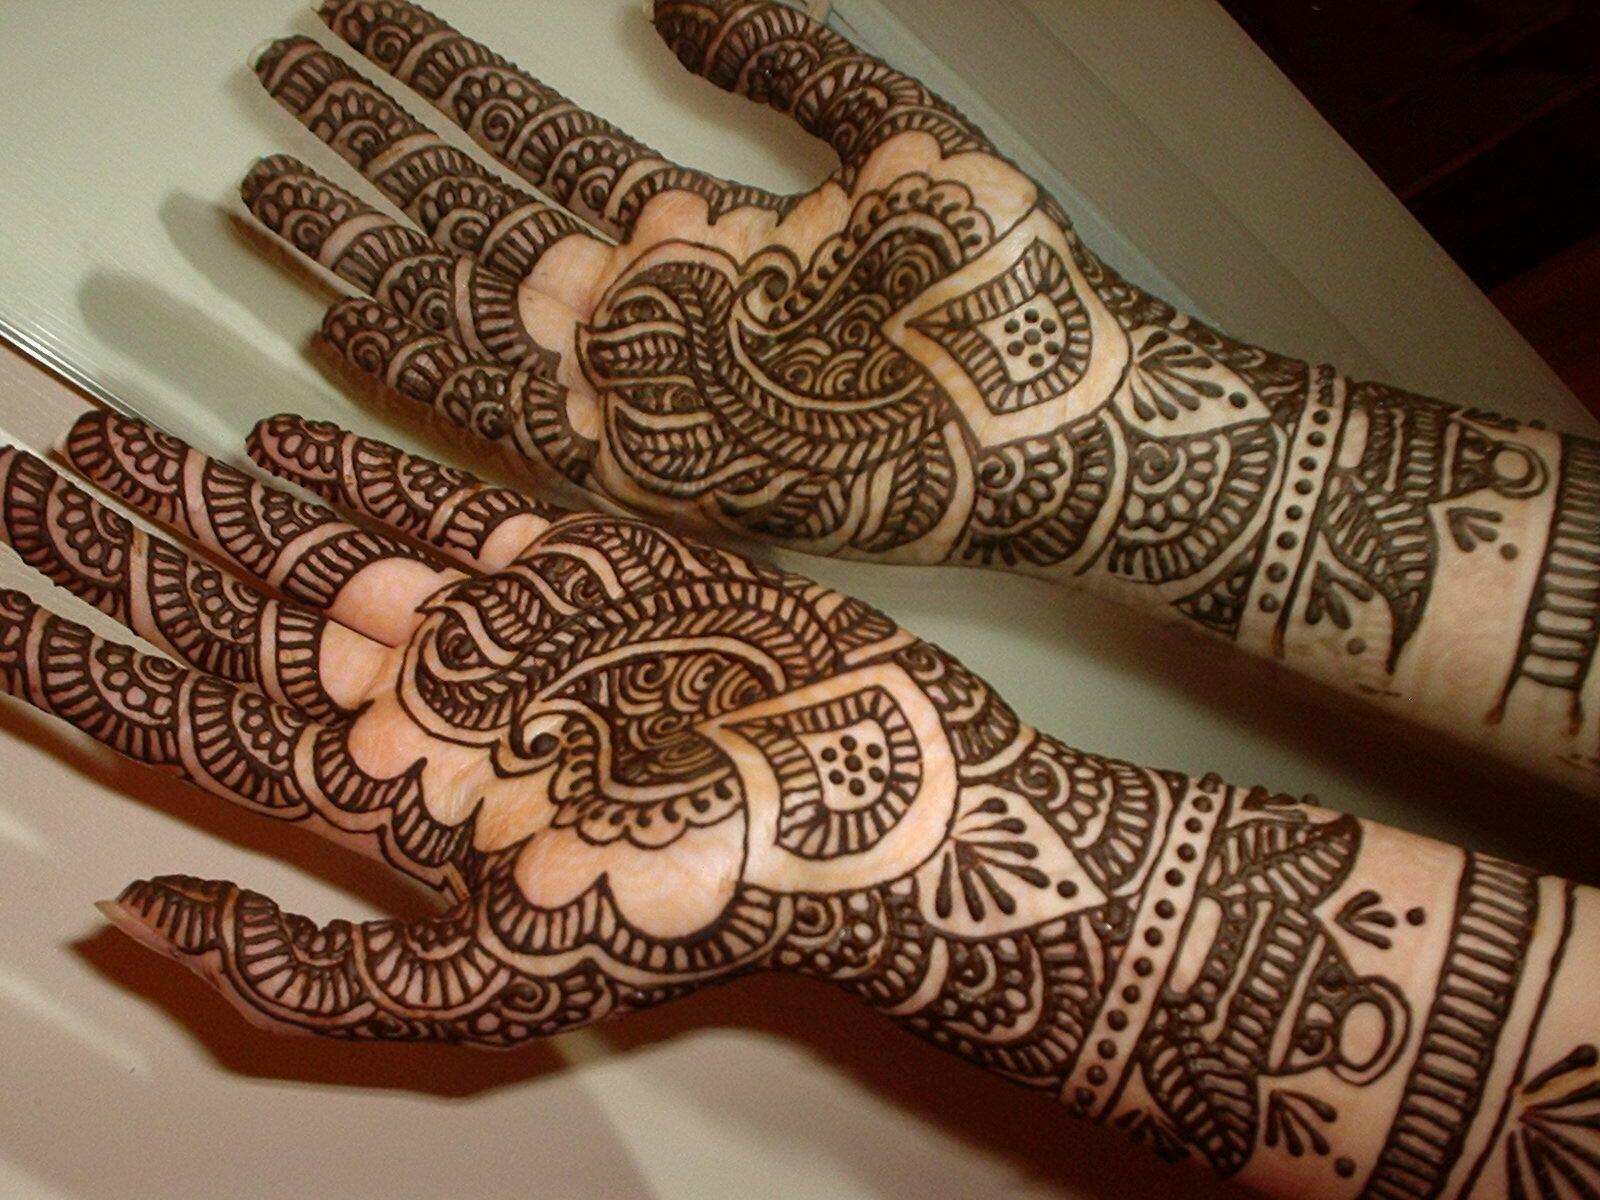 High Quality Mehndi Designs : High quality mehndi designs makedes.com